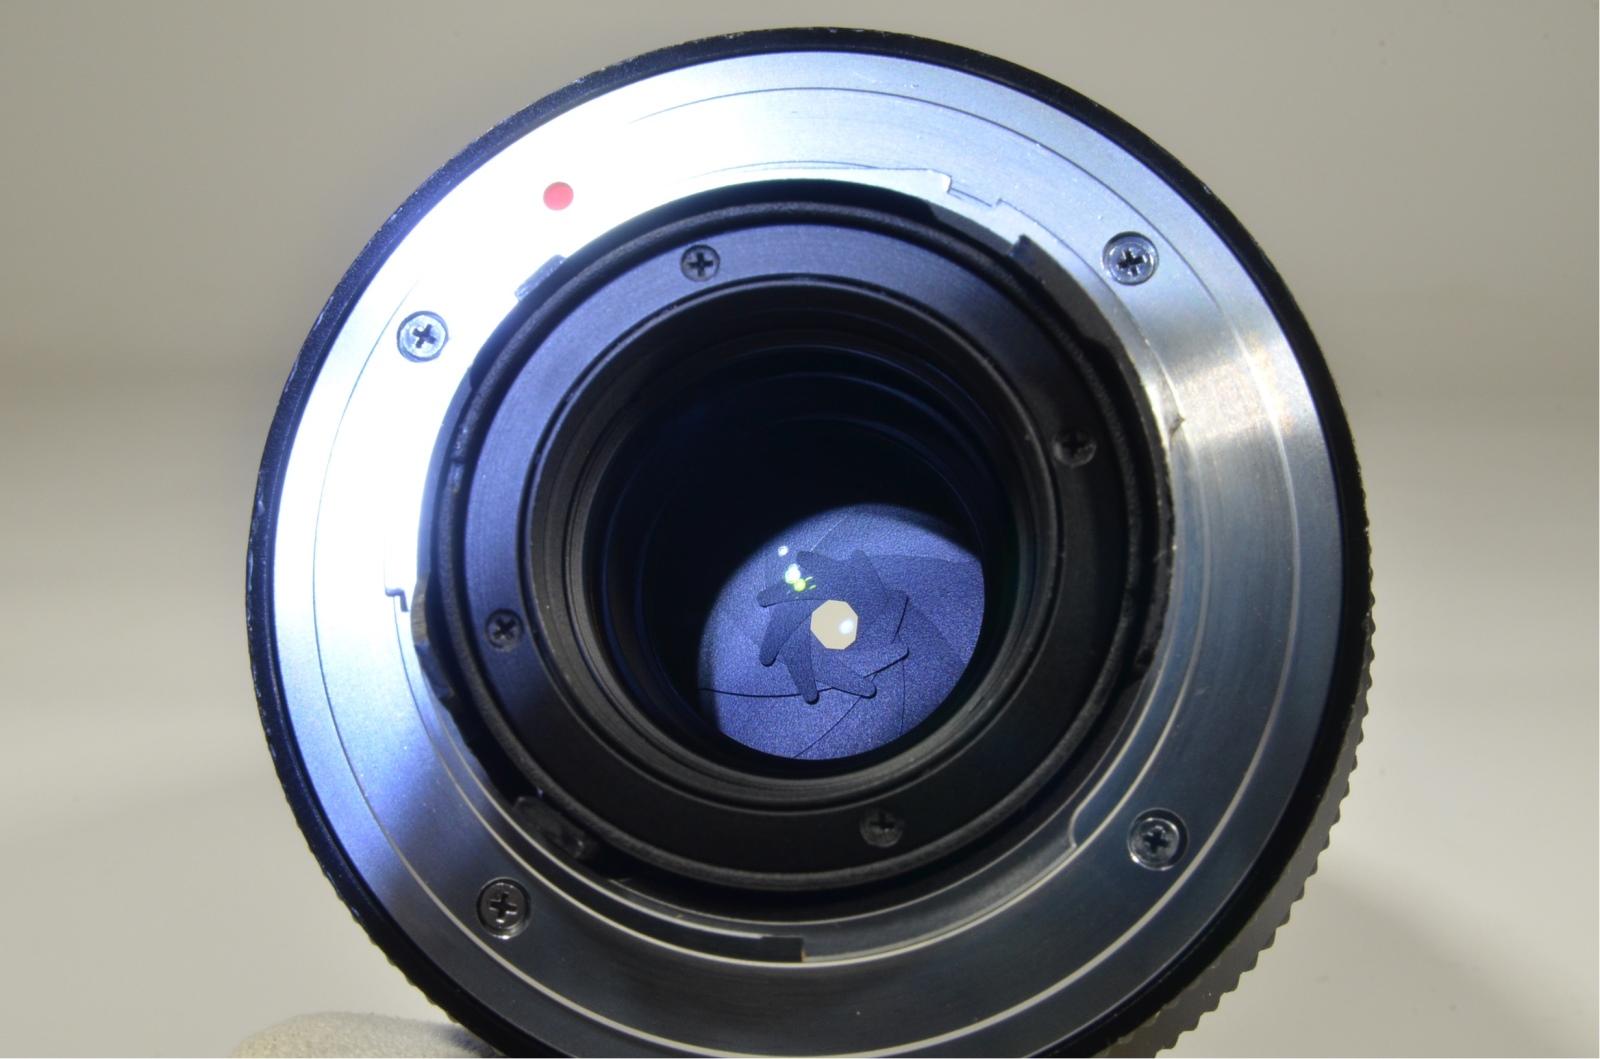 contax carl zeiss makro-planar t* 100mm f2.8 aej